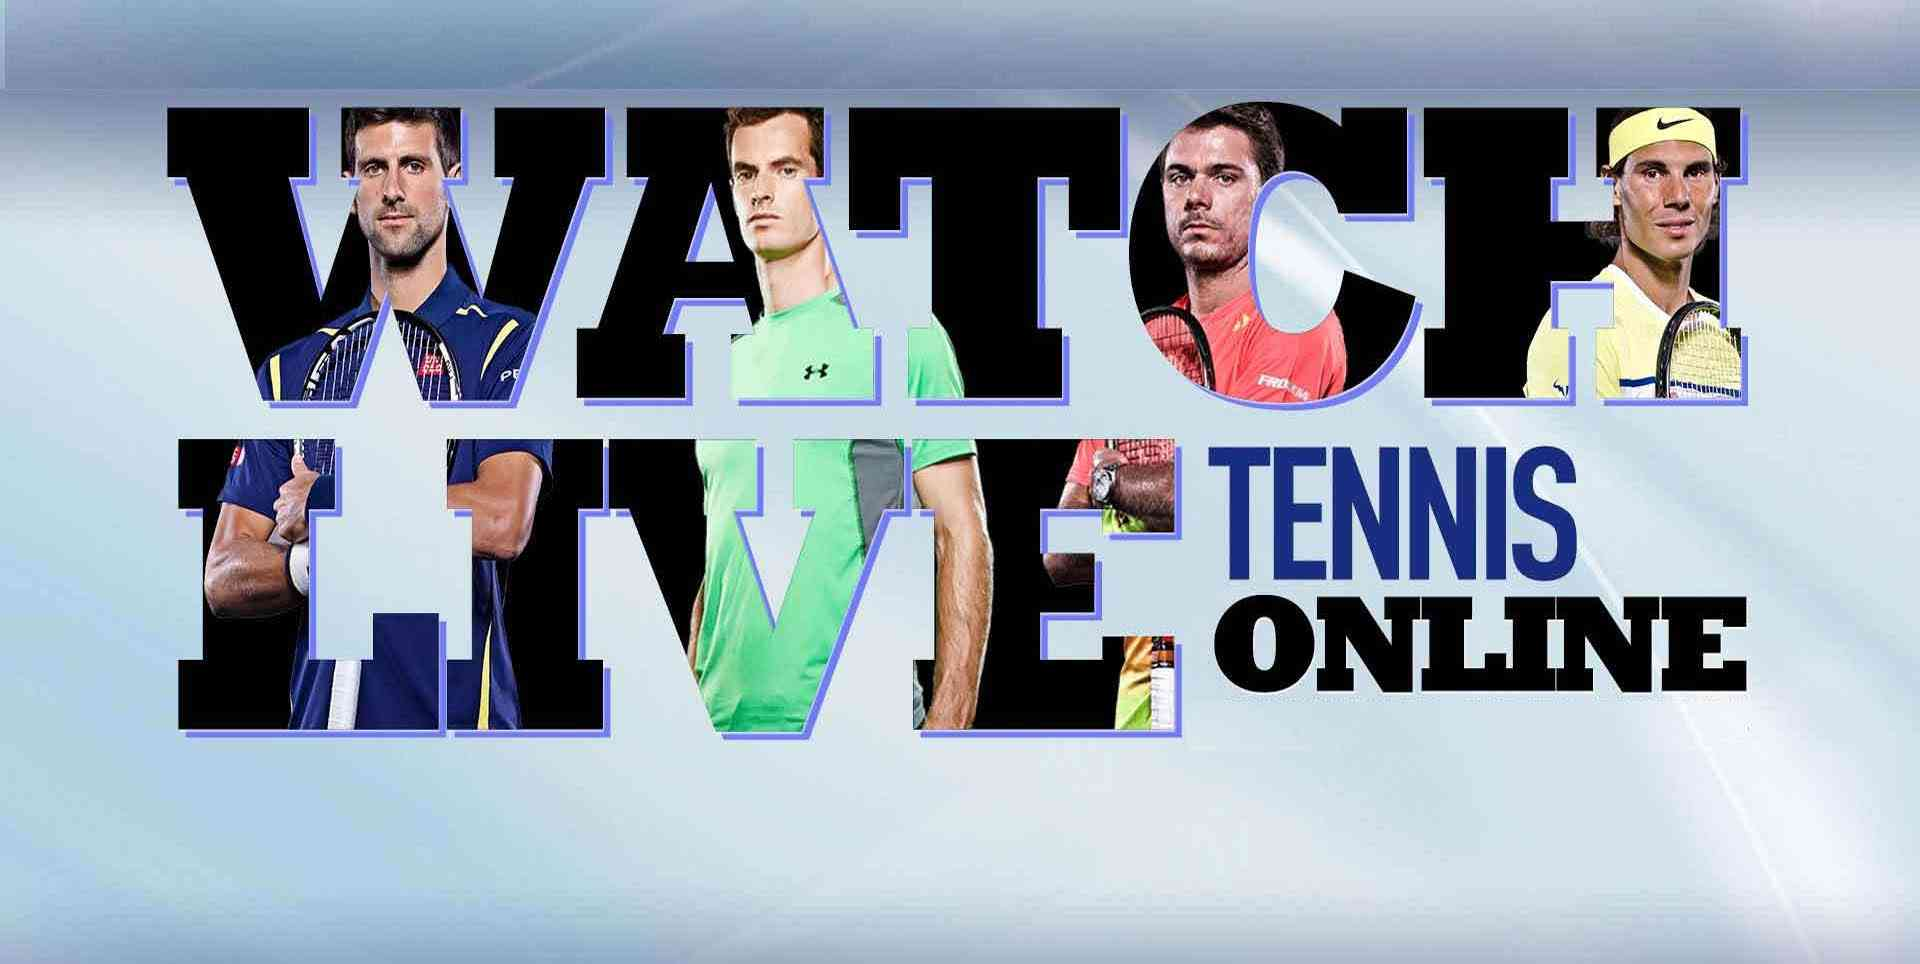 Stream Roberto Bautista Agut vs Dominic Thiem Online